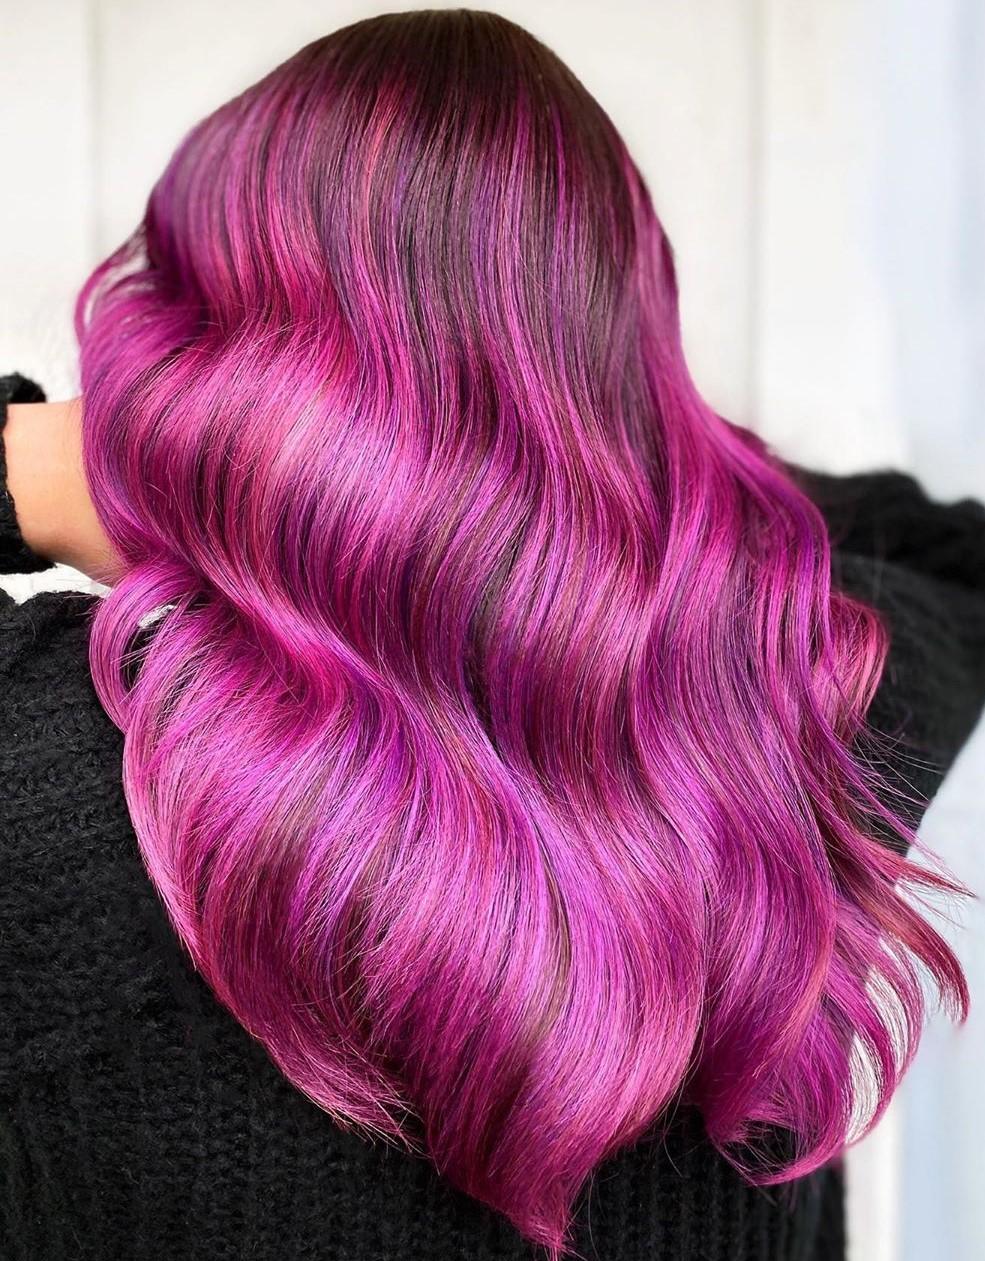 Dark Hair with Fuchsia Balayage